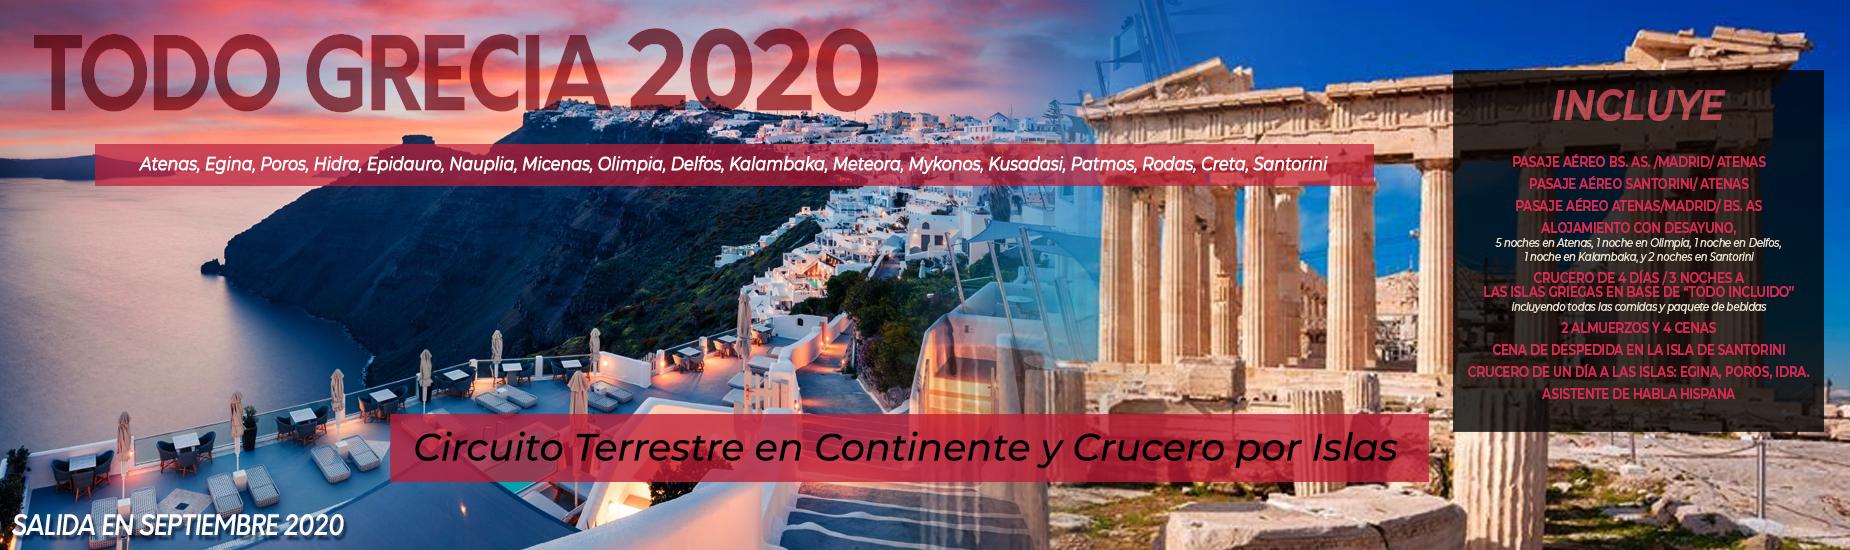 TODO GRECIA 2020